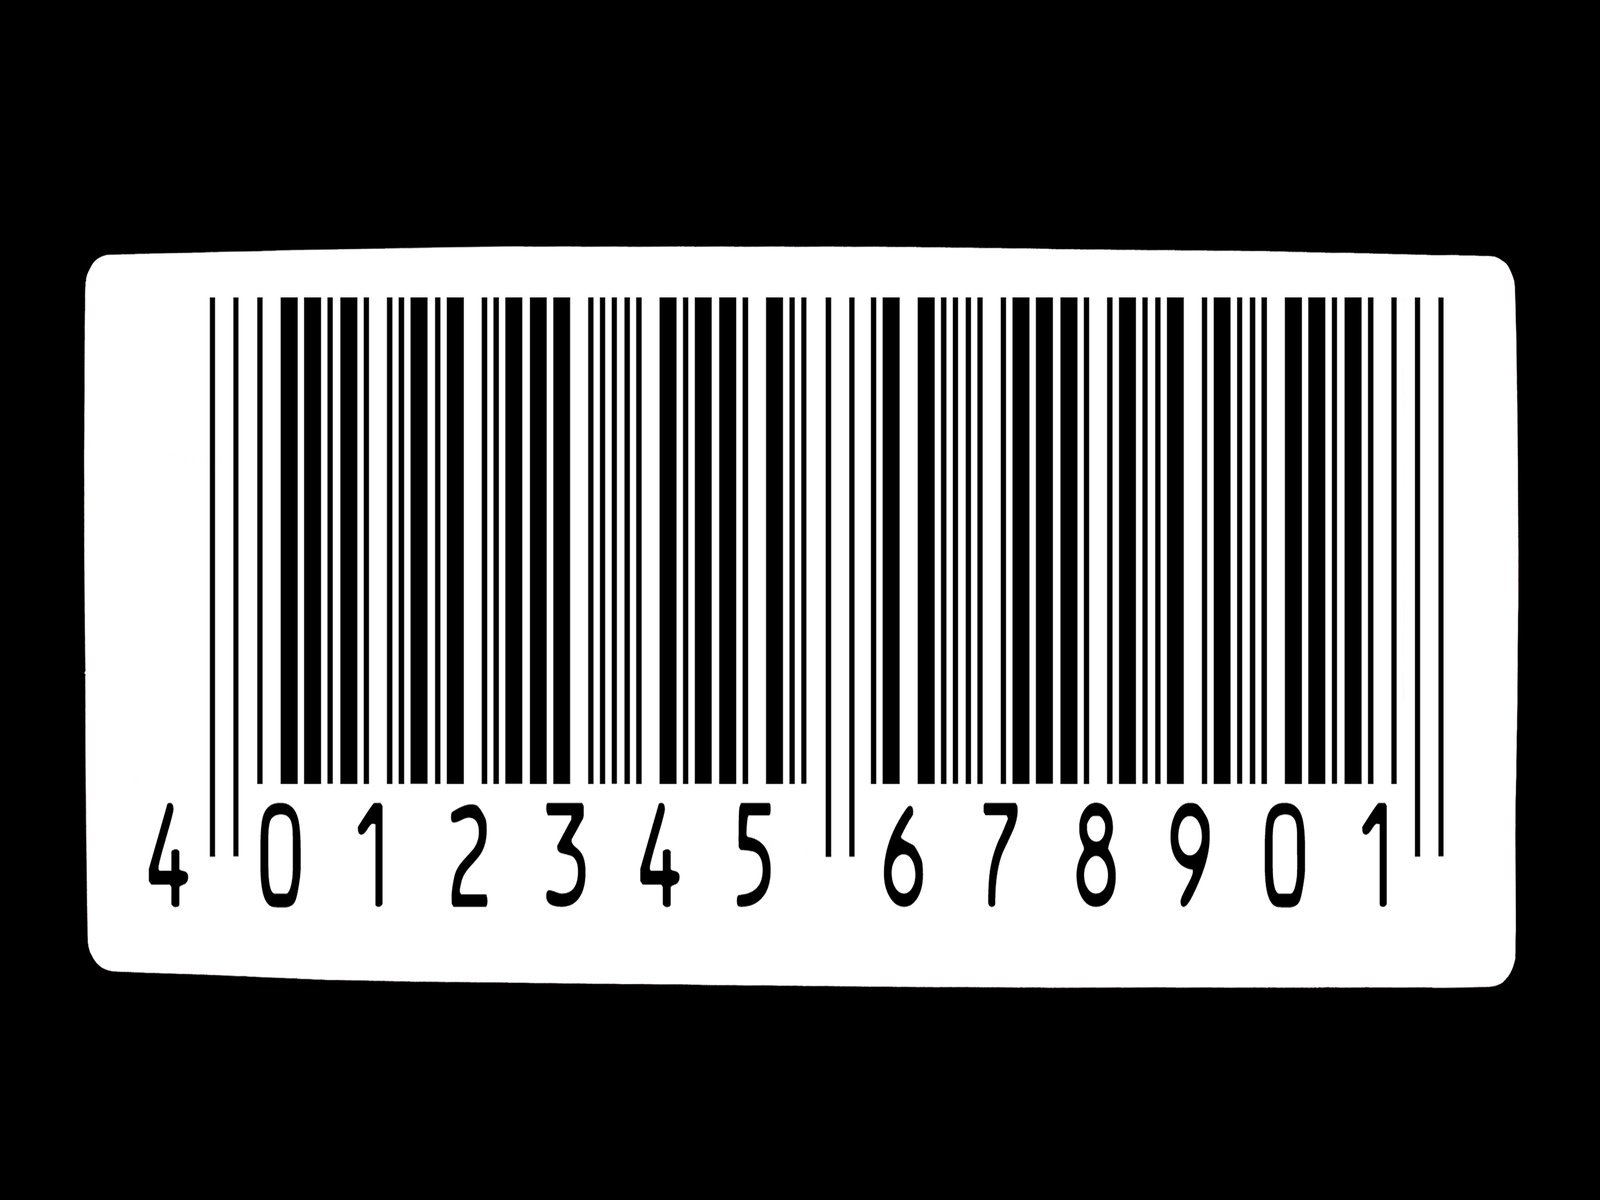 Barcode,background,bar,barcode